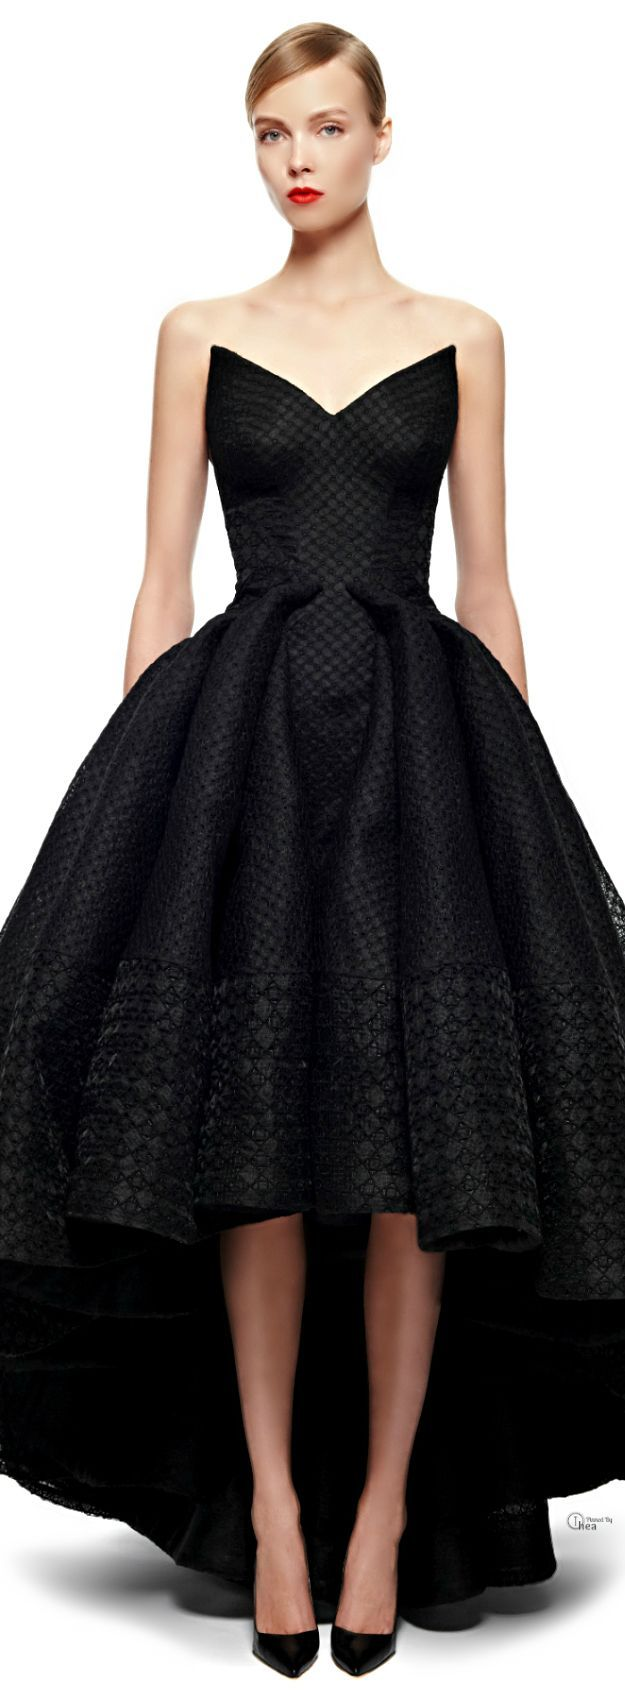 Evening dresses black tie wedding